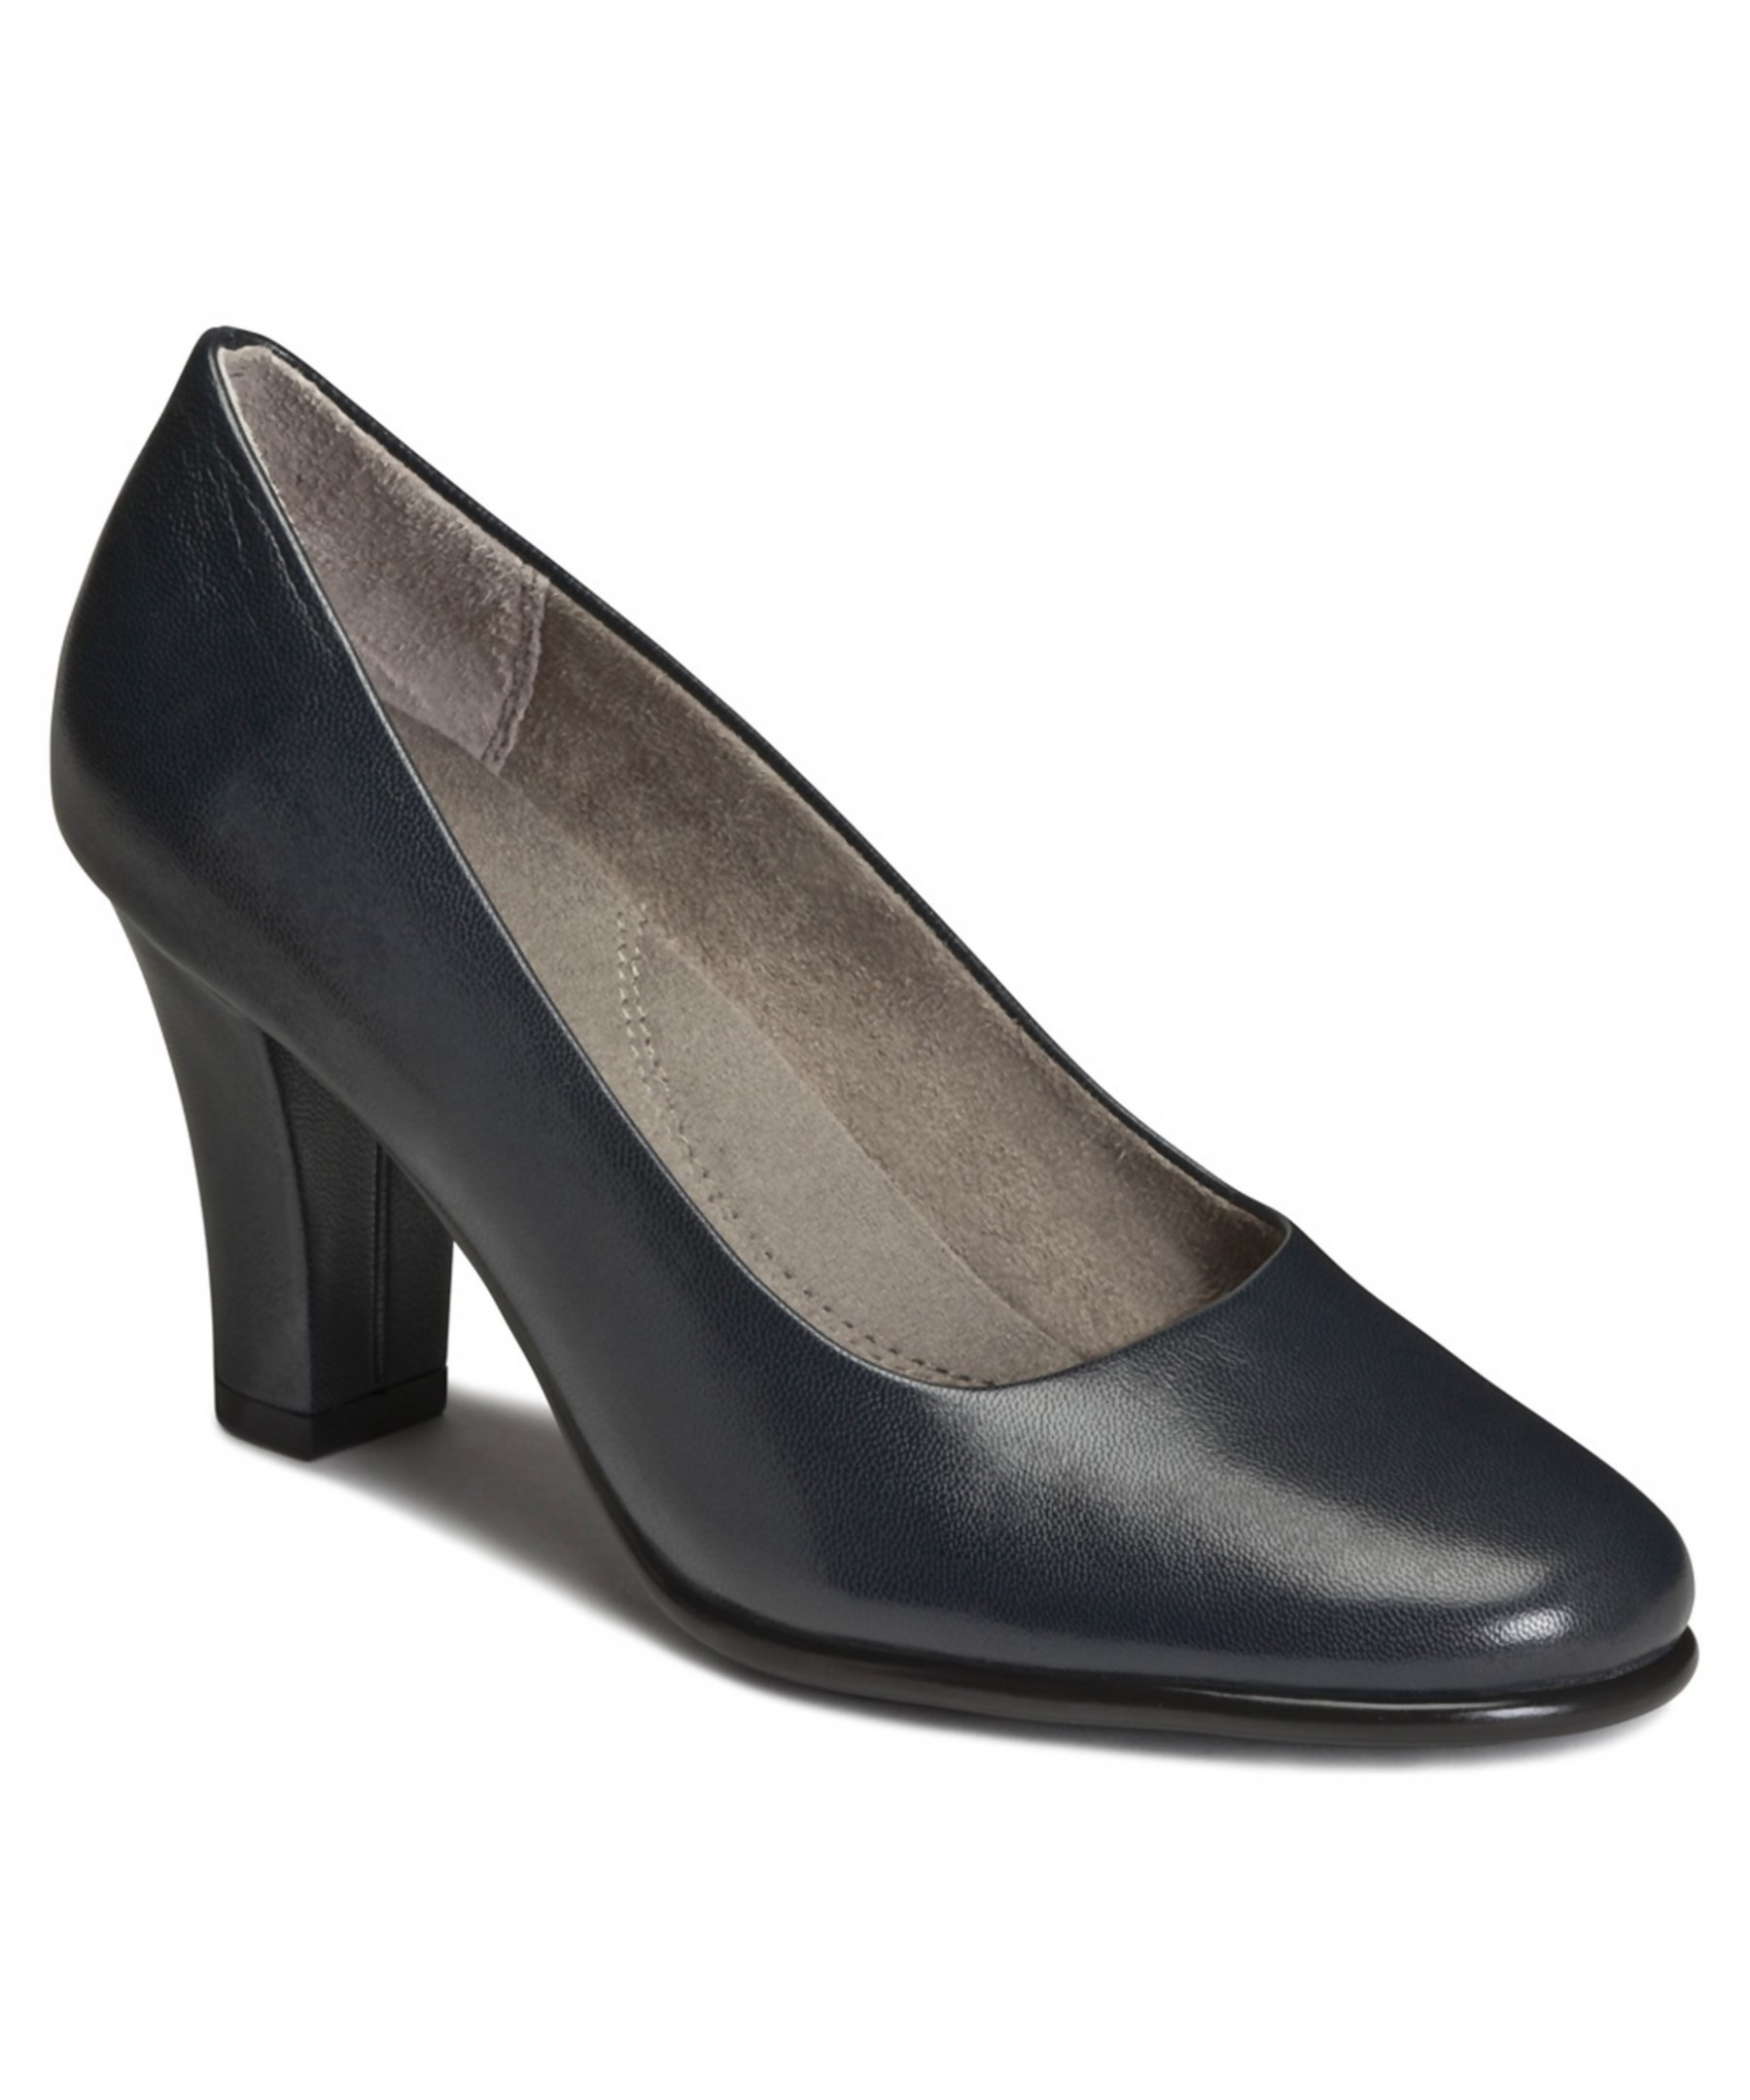 Aerosole Womens Dress Flats Shoes Size